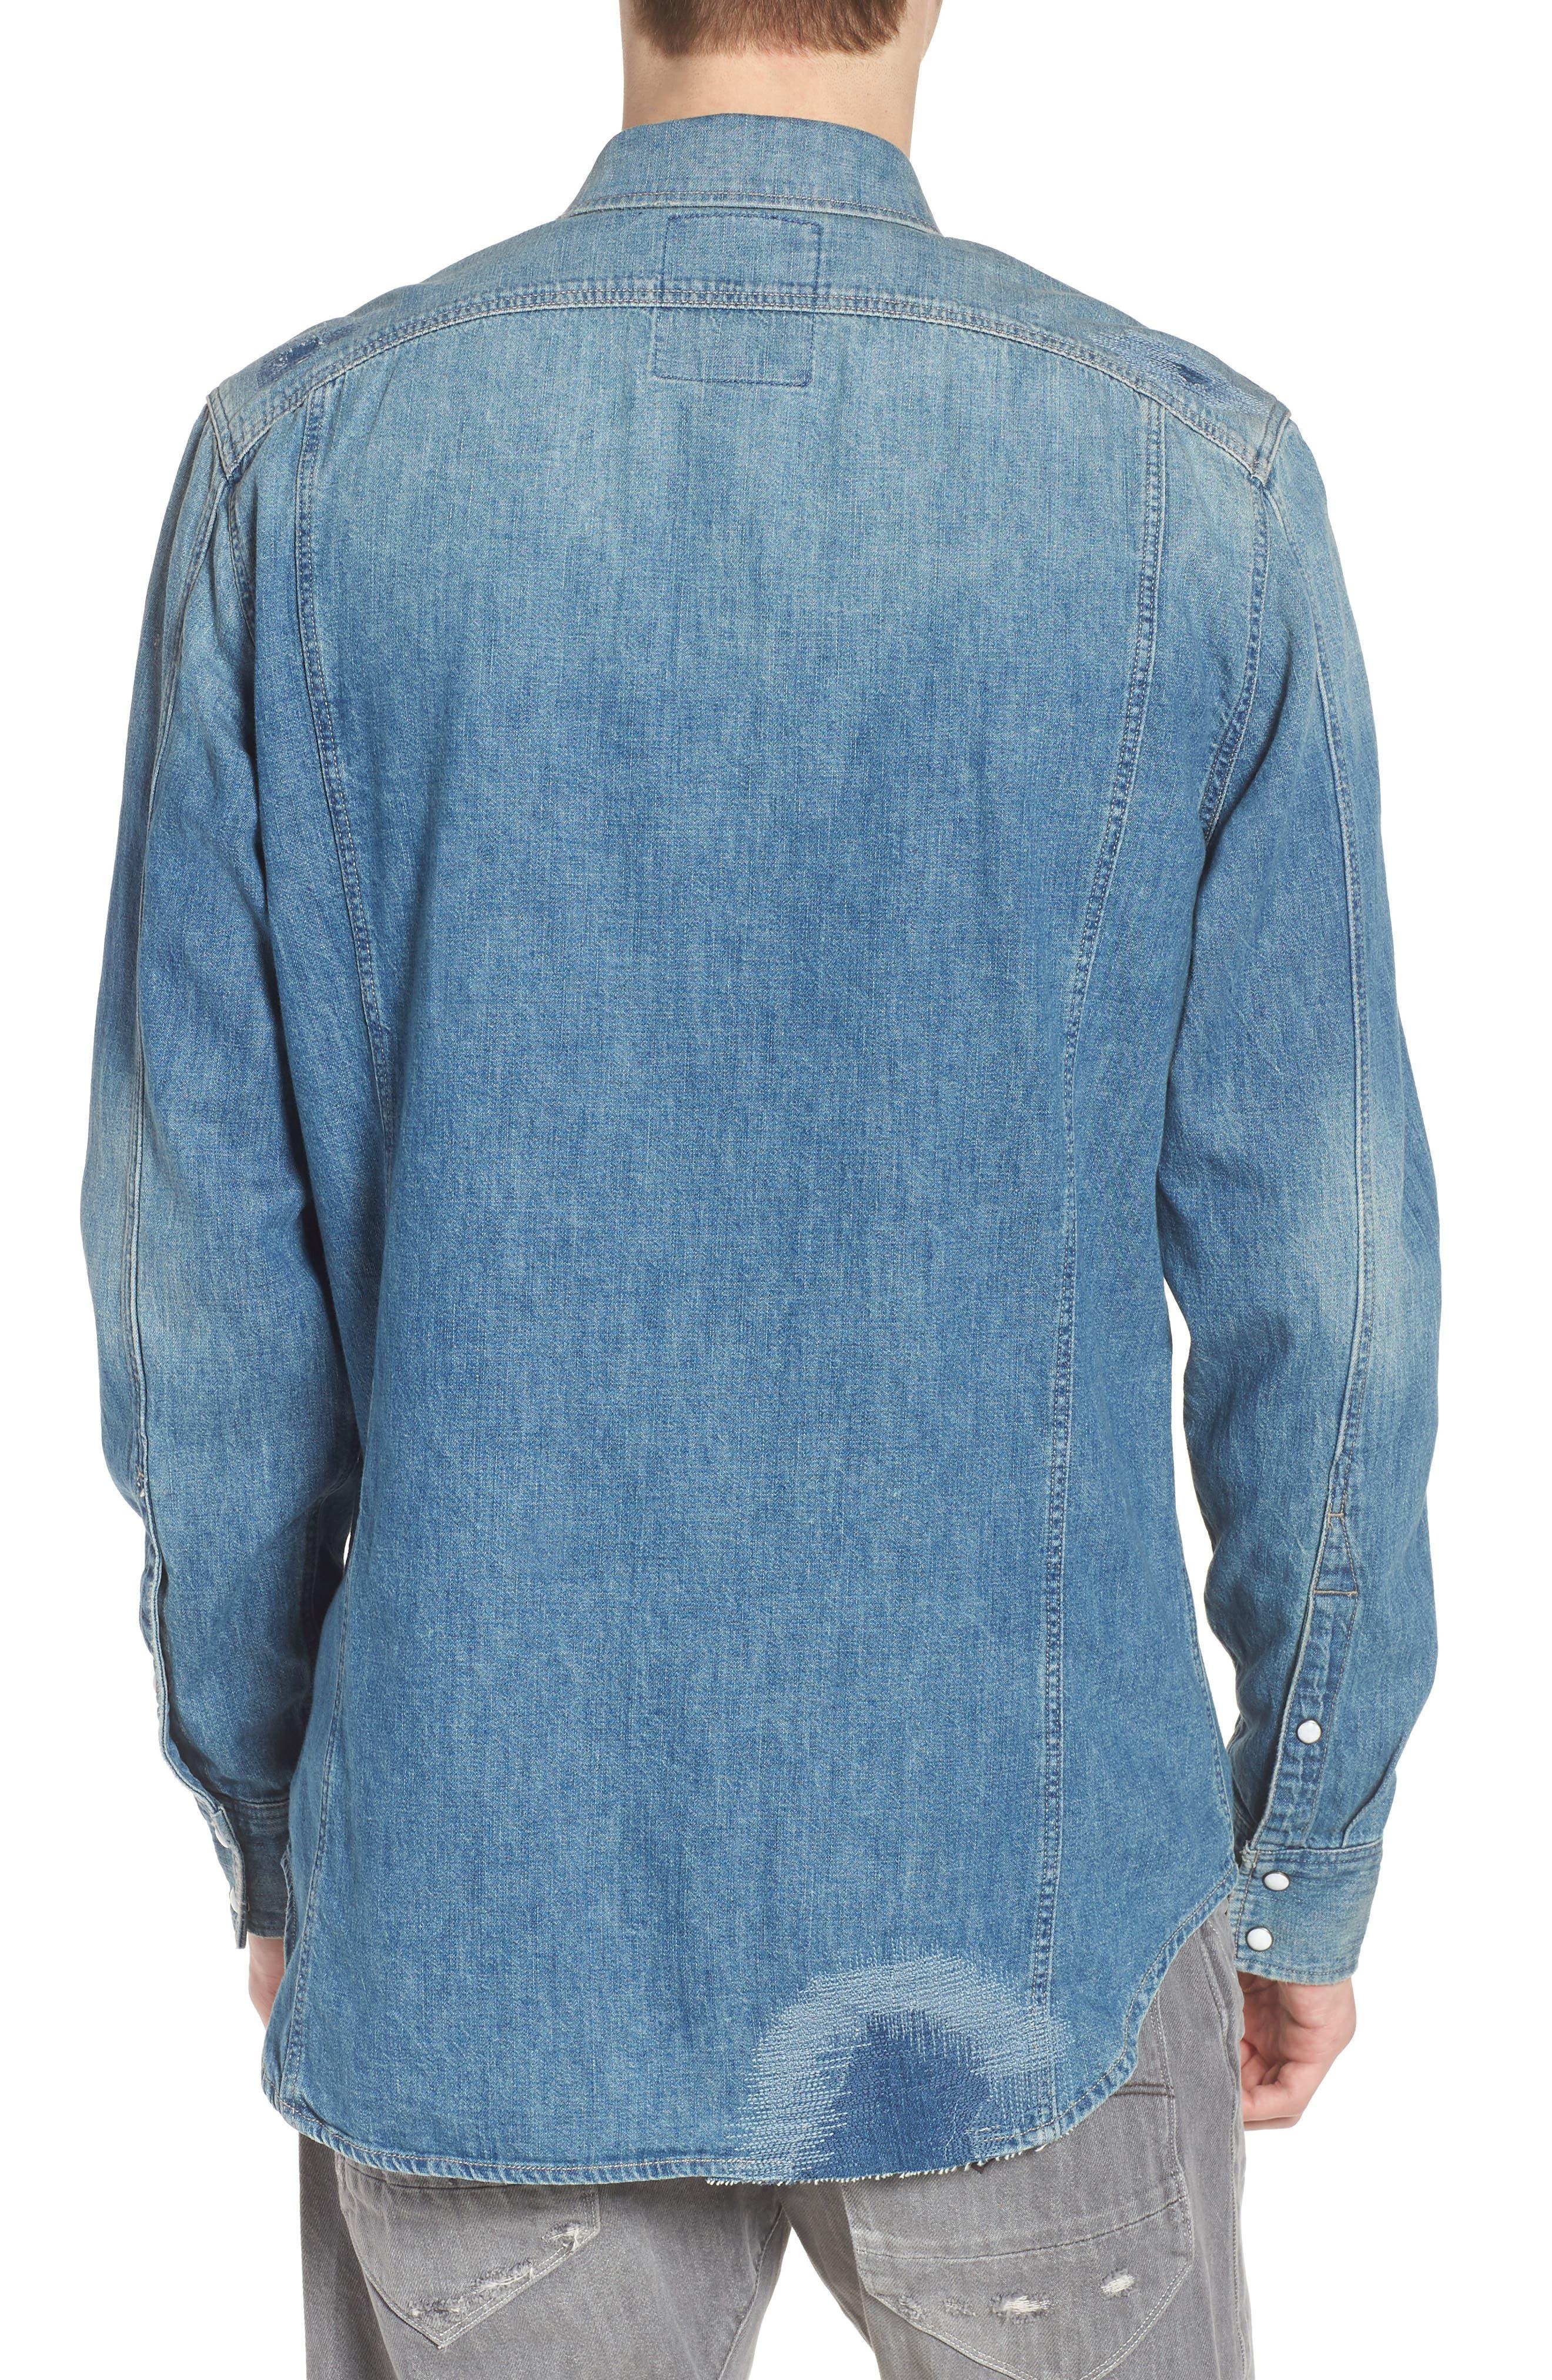 3301 Graft Denim Shirt,                             Alternate thumbnail 2, color,